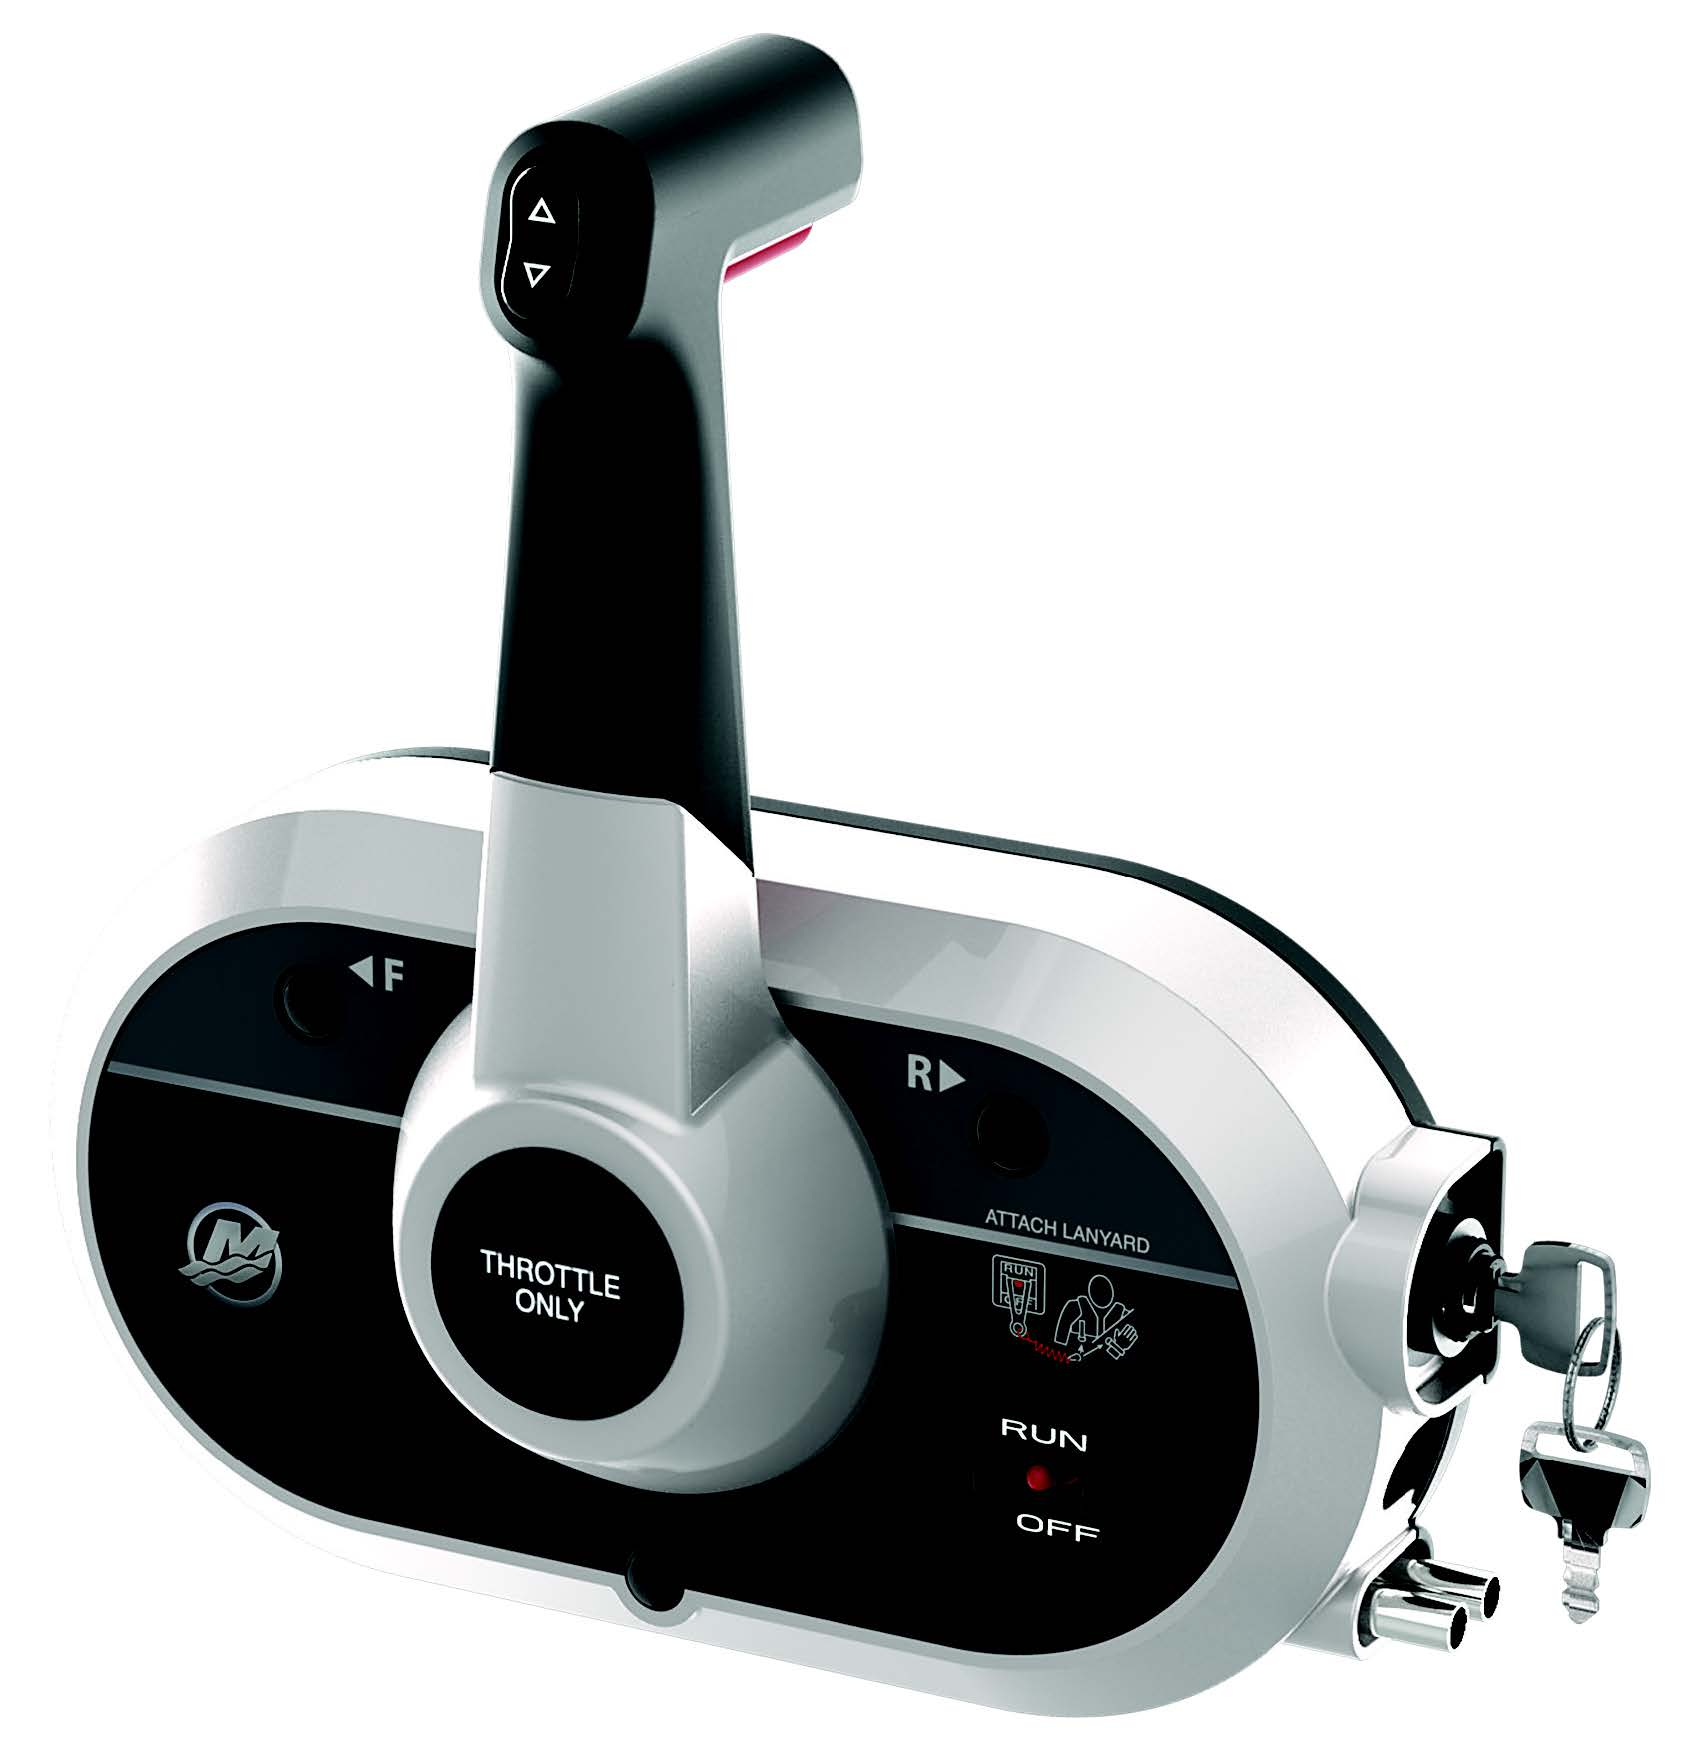 sidemountcontrol oem mercury outboard mechanical side mount remote control 14 pin mercury 14 pin wiring harness at gsmportal.co